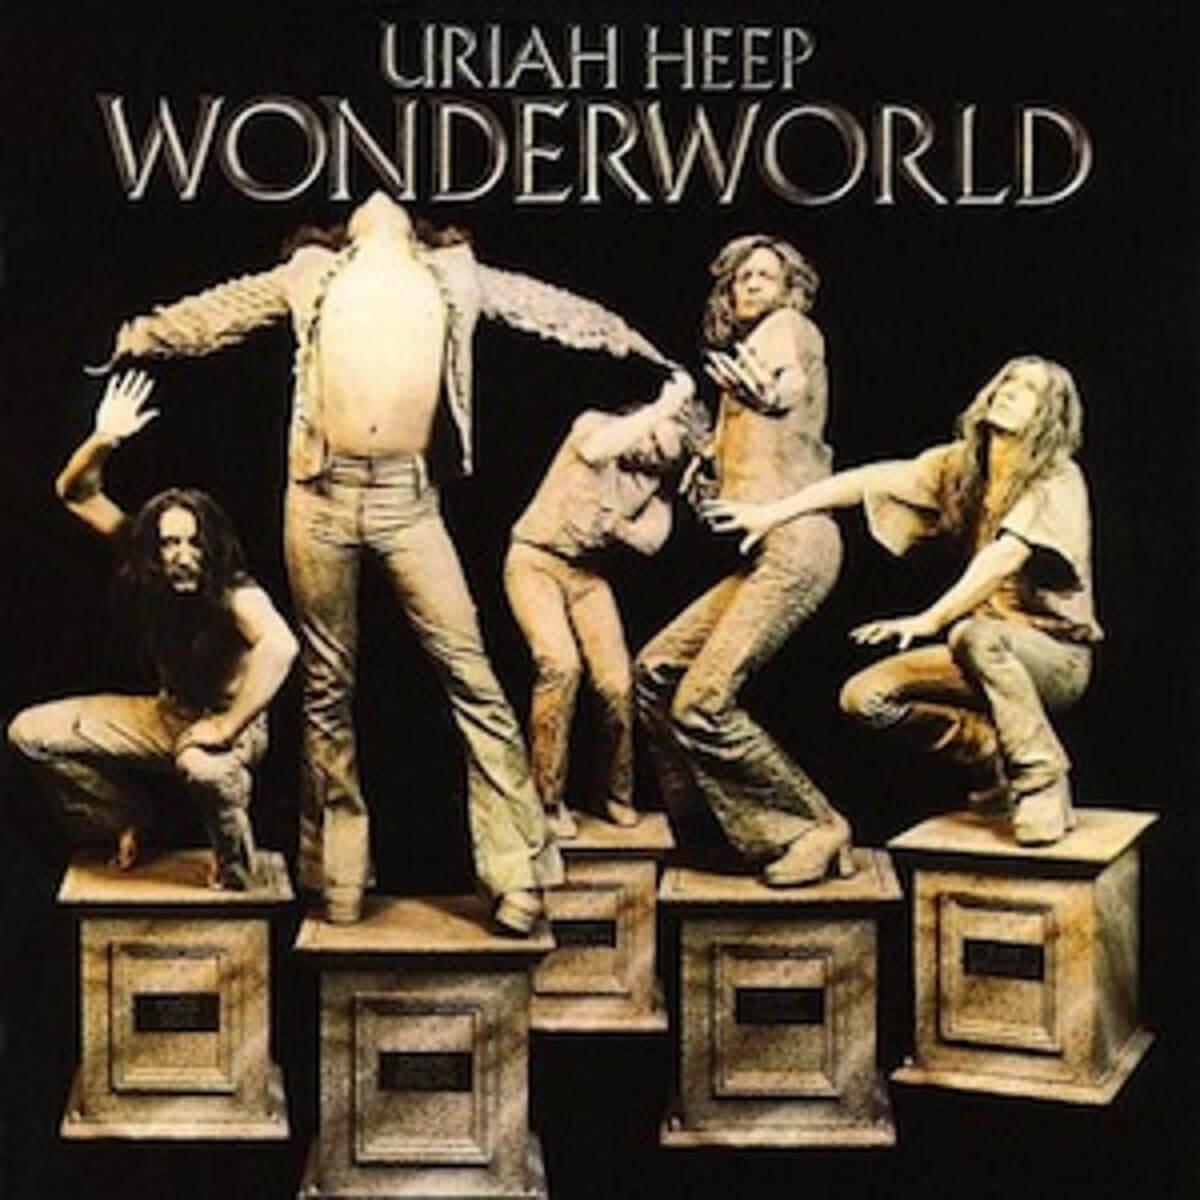 Uriah Heep - Wonderword - Cubierta de vinilo